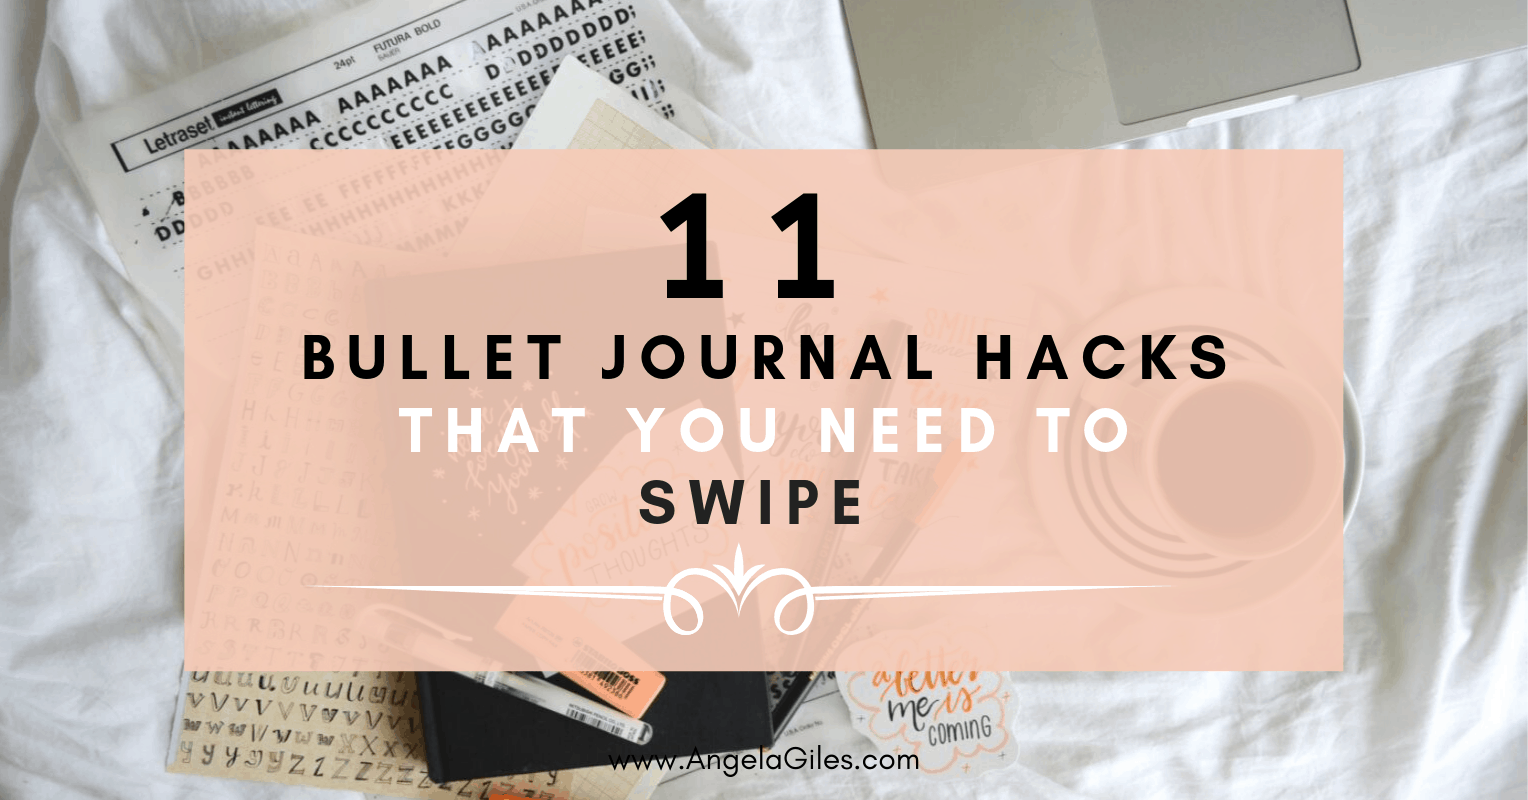 11 BULLET JOURNAL HACKS THAT YOU NEED TO SWIPE